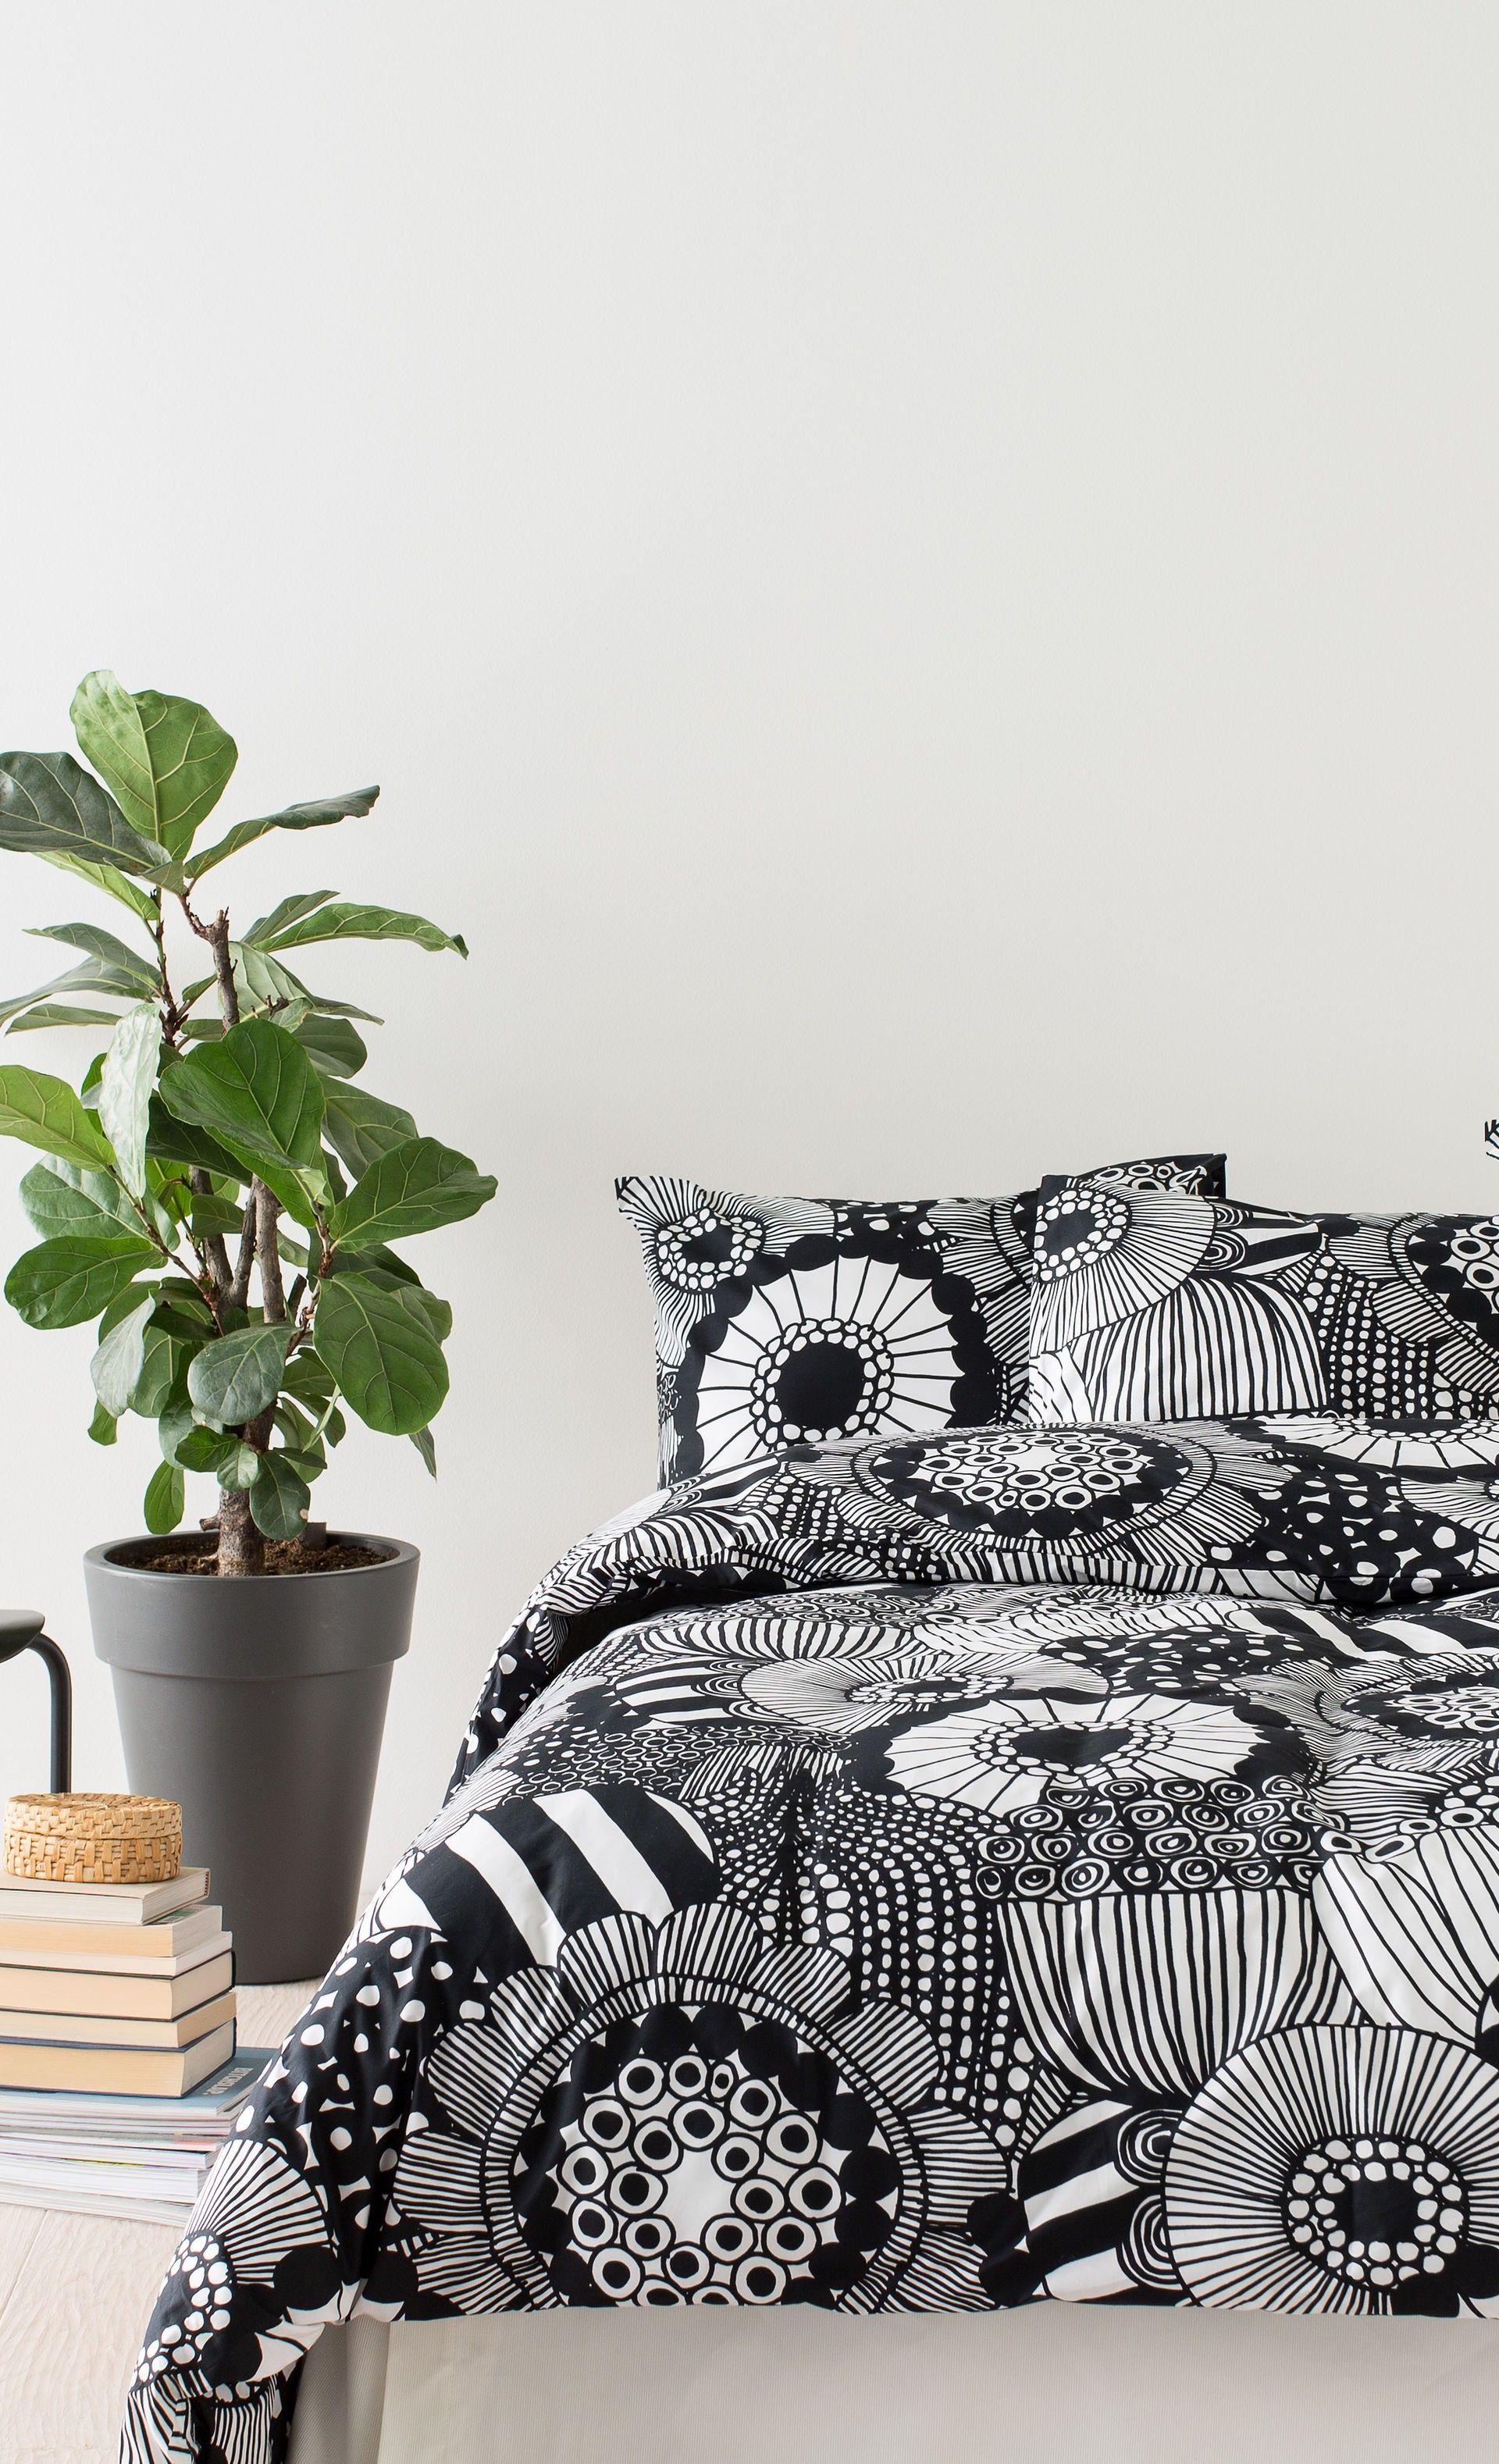 fabulous bedding linen bedlinen unikko duvet bed marimekko green with covers ruutu